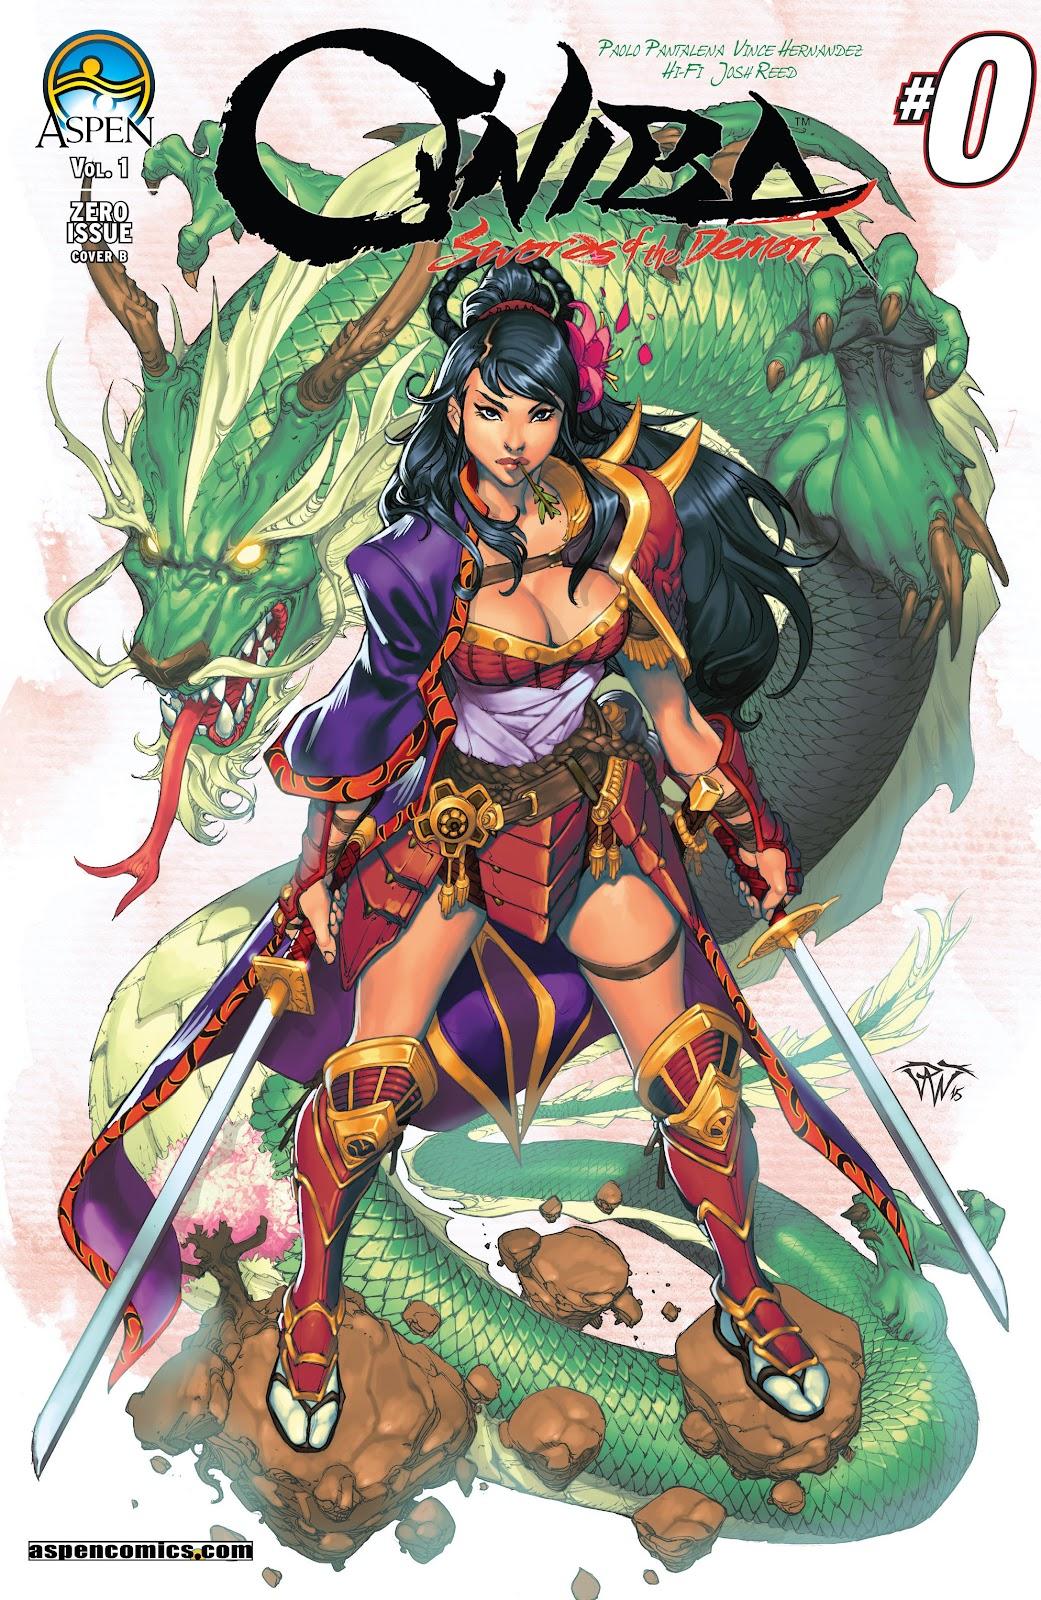 Read online Oniba: Swords of the Demon comic -  Issue # Full - 2